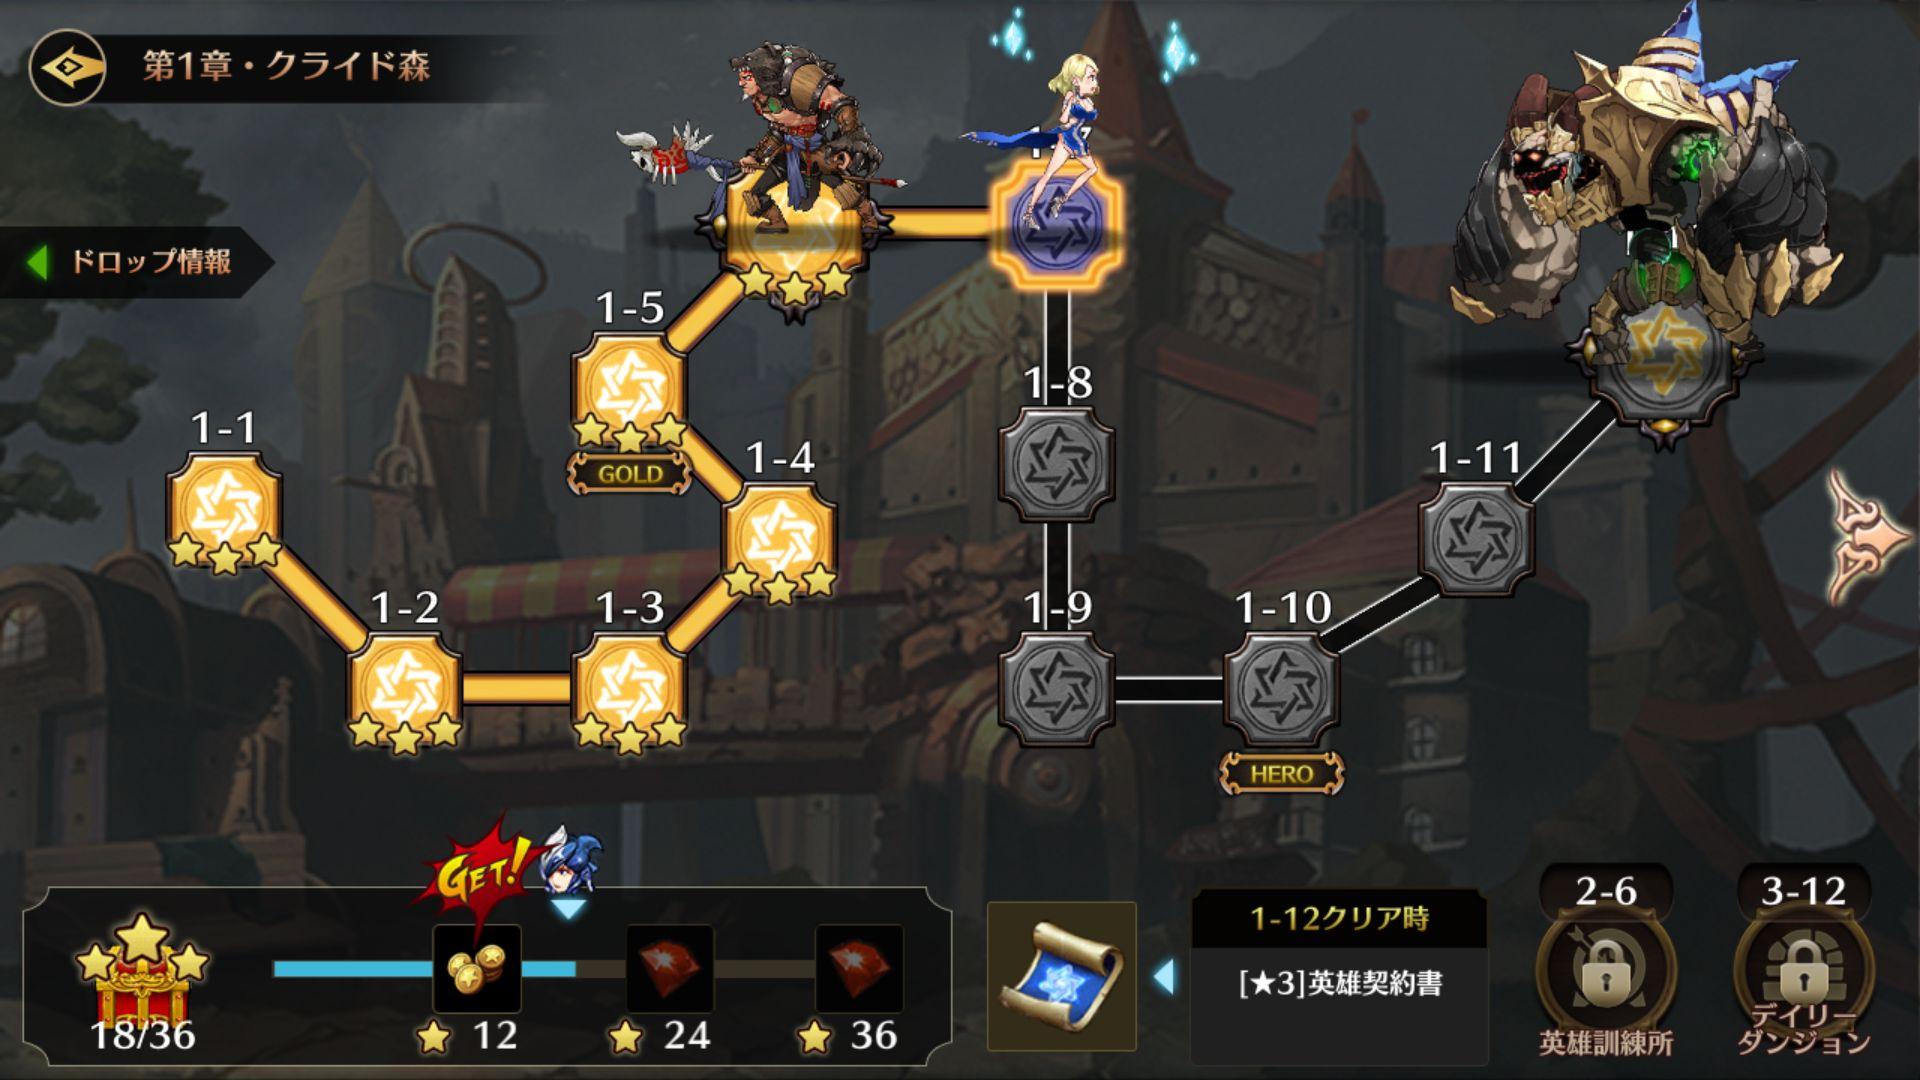 androidアプリ カオスクロニクル(Chaos Chronicle)攻略スクリーンショット1